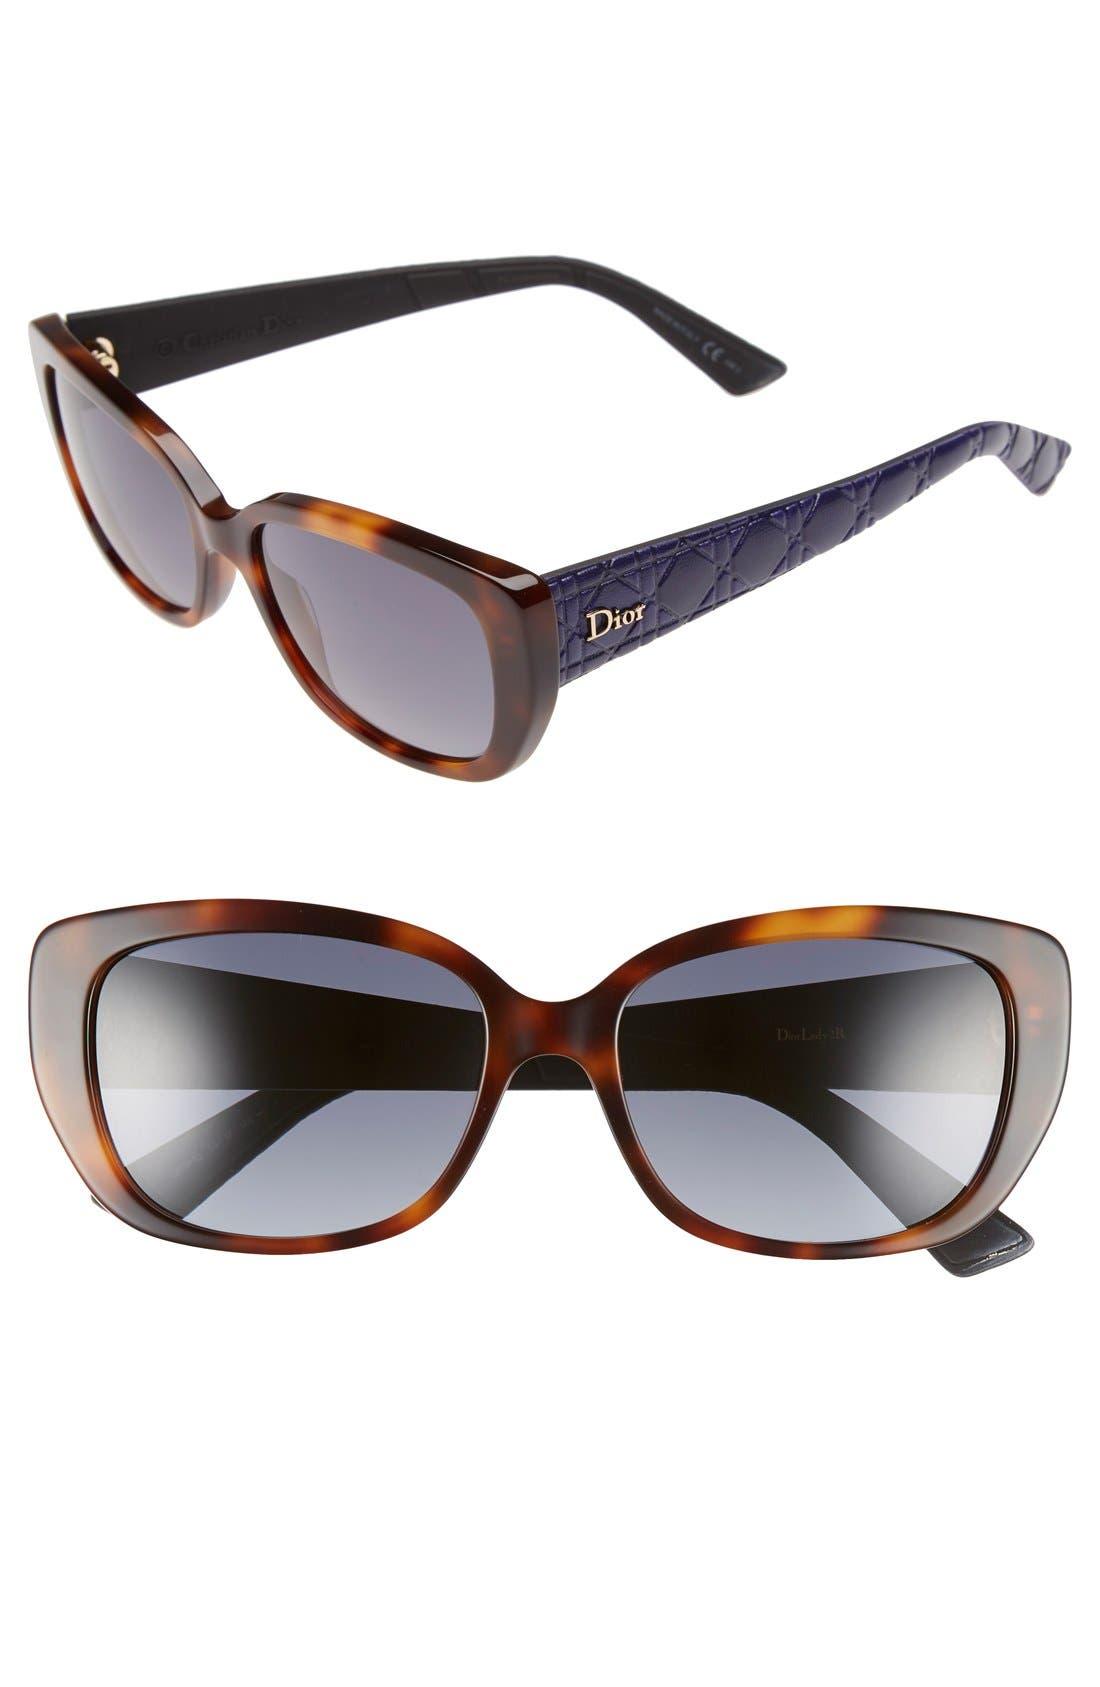 Lady 55mm Cat Eye Sunglasses,                             Main thumbnail 1, color,                             Havana/ Blue